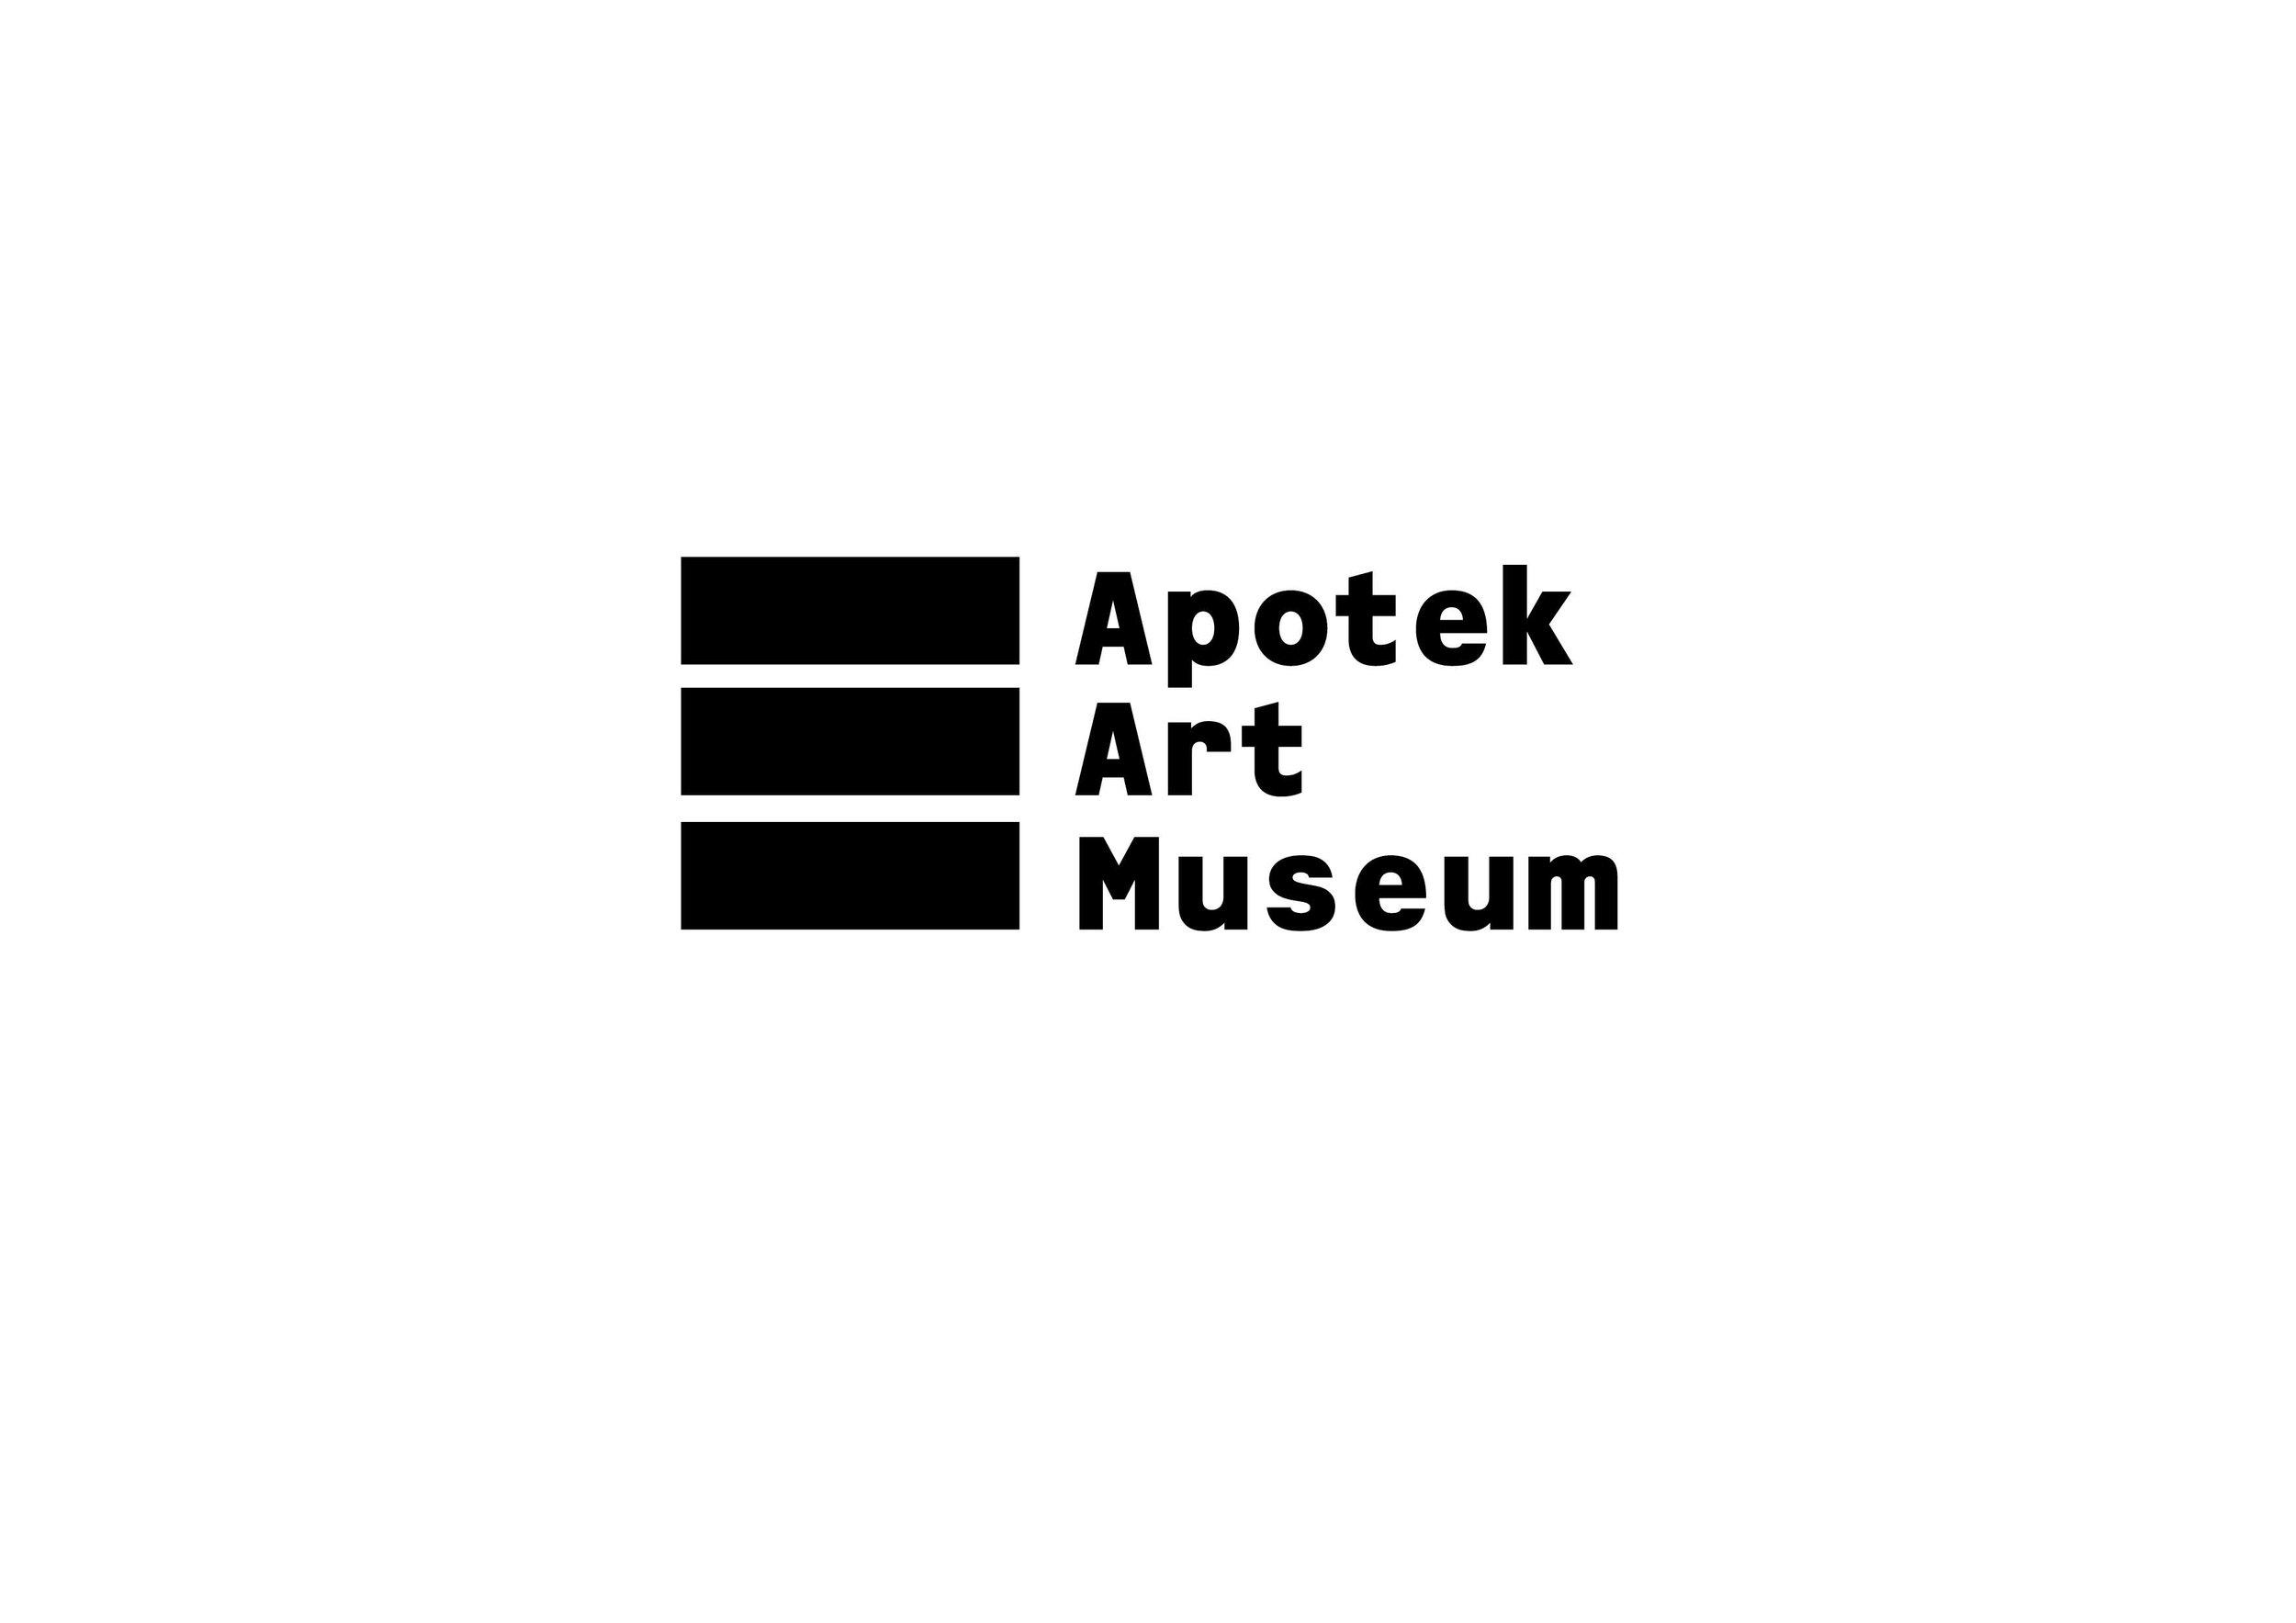 Apotek Art Museum, brand suggestion (2013)